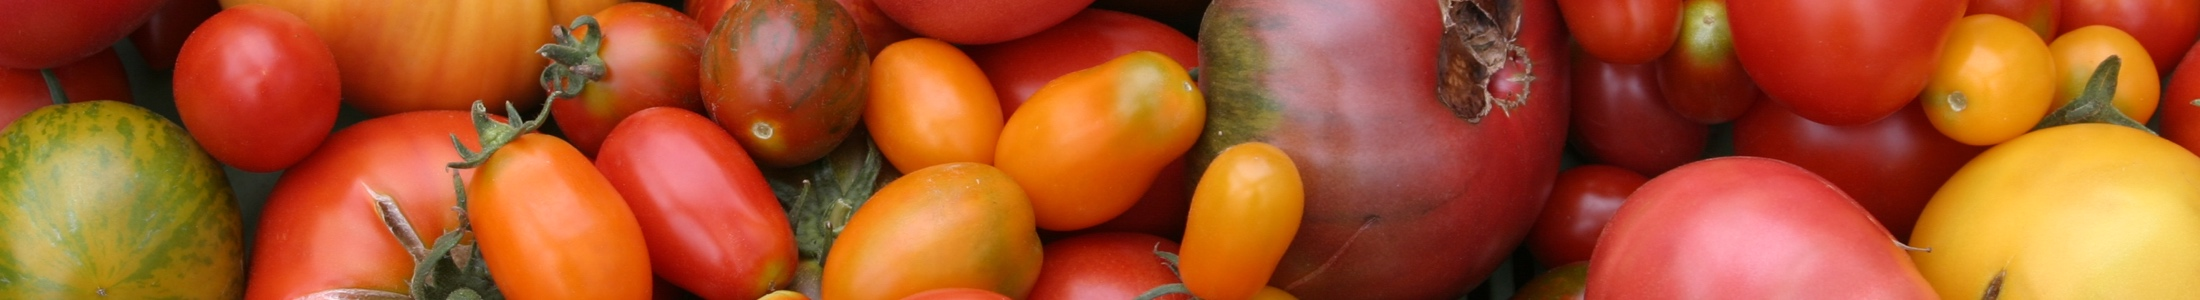 Tomatenvielfalt (Foto: Thomas Jaksch)